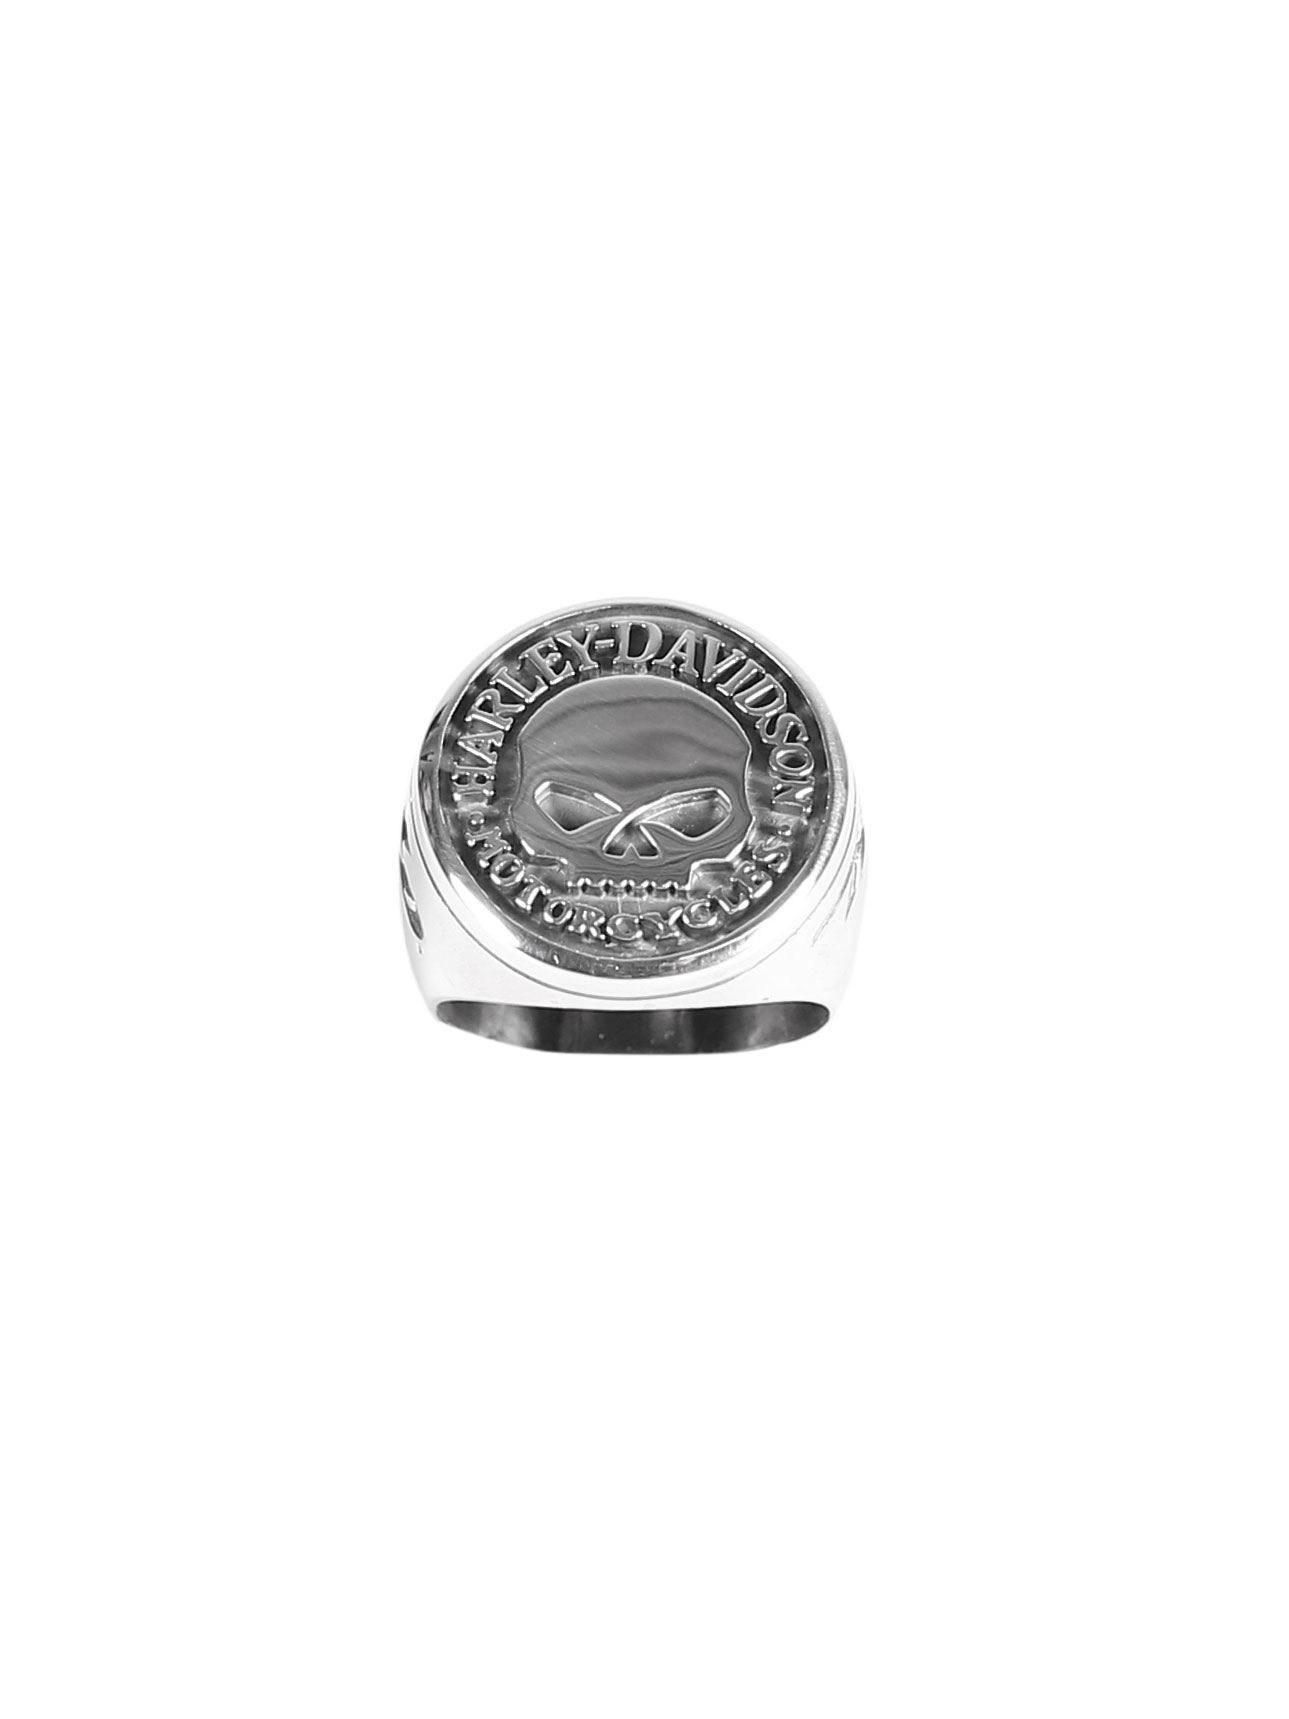 Harley Davidson Schmuck Ringe